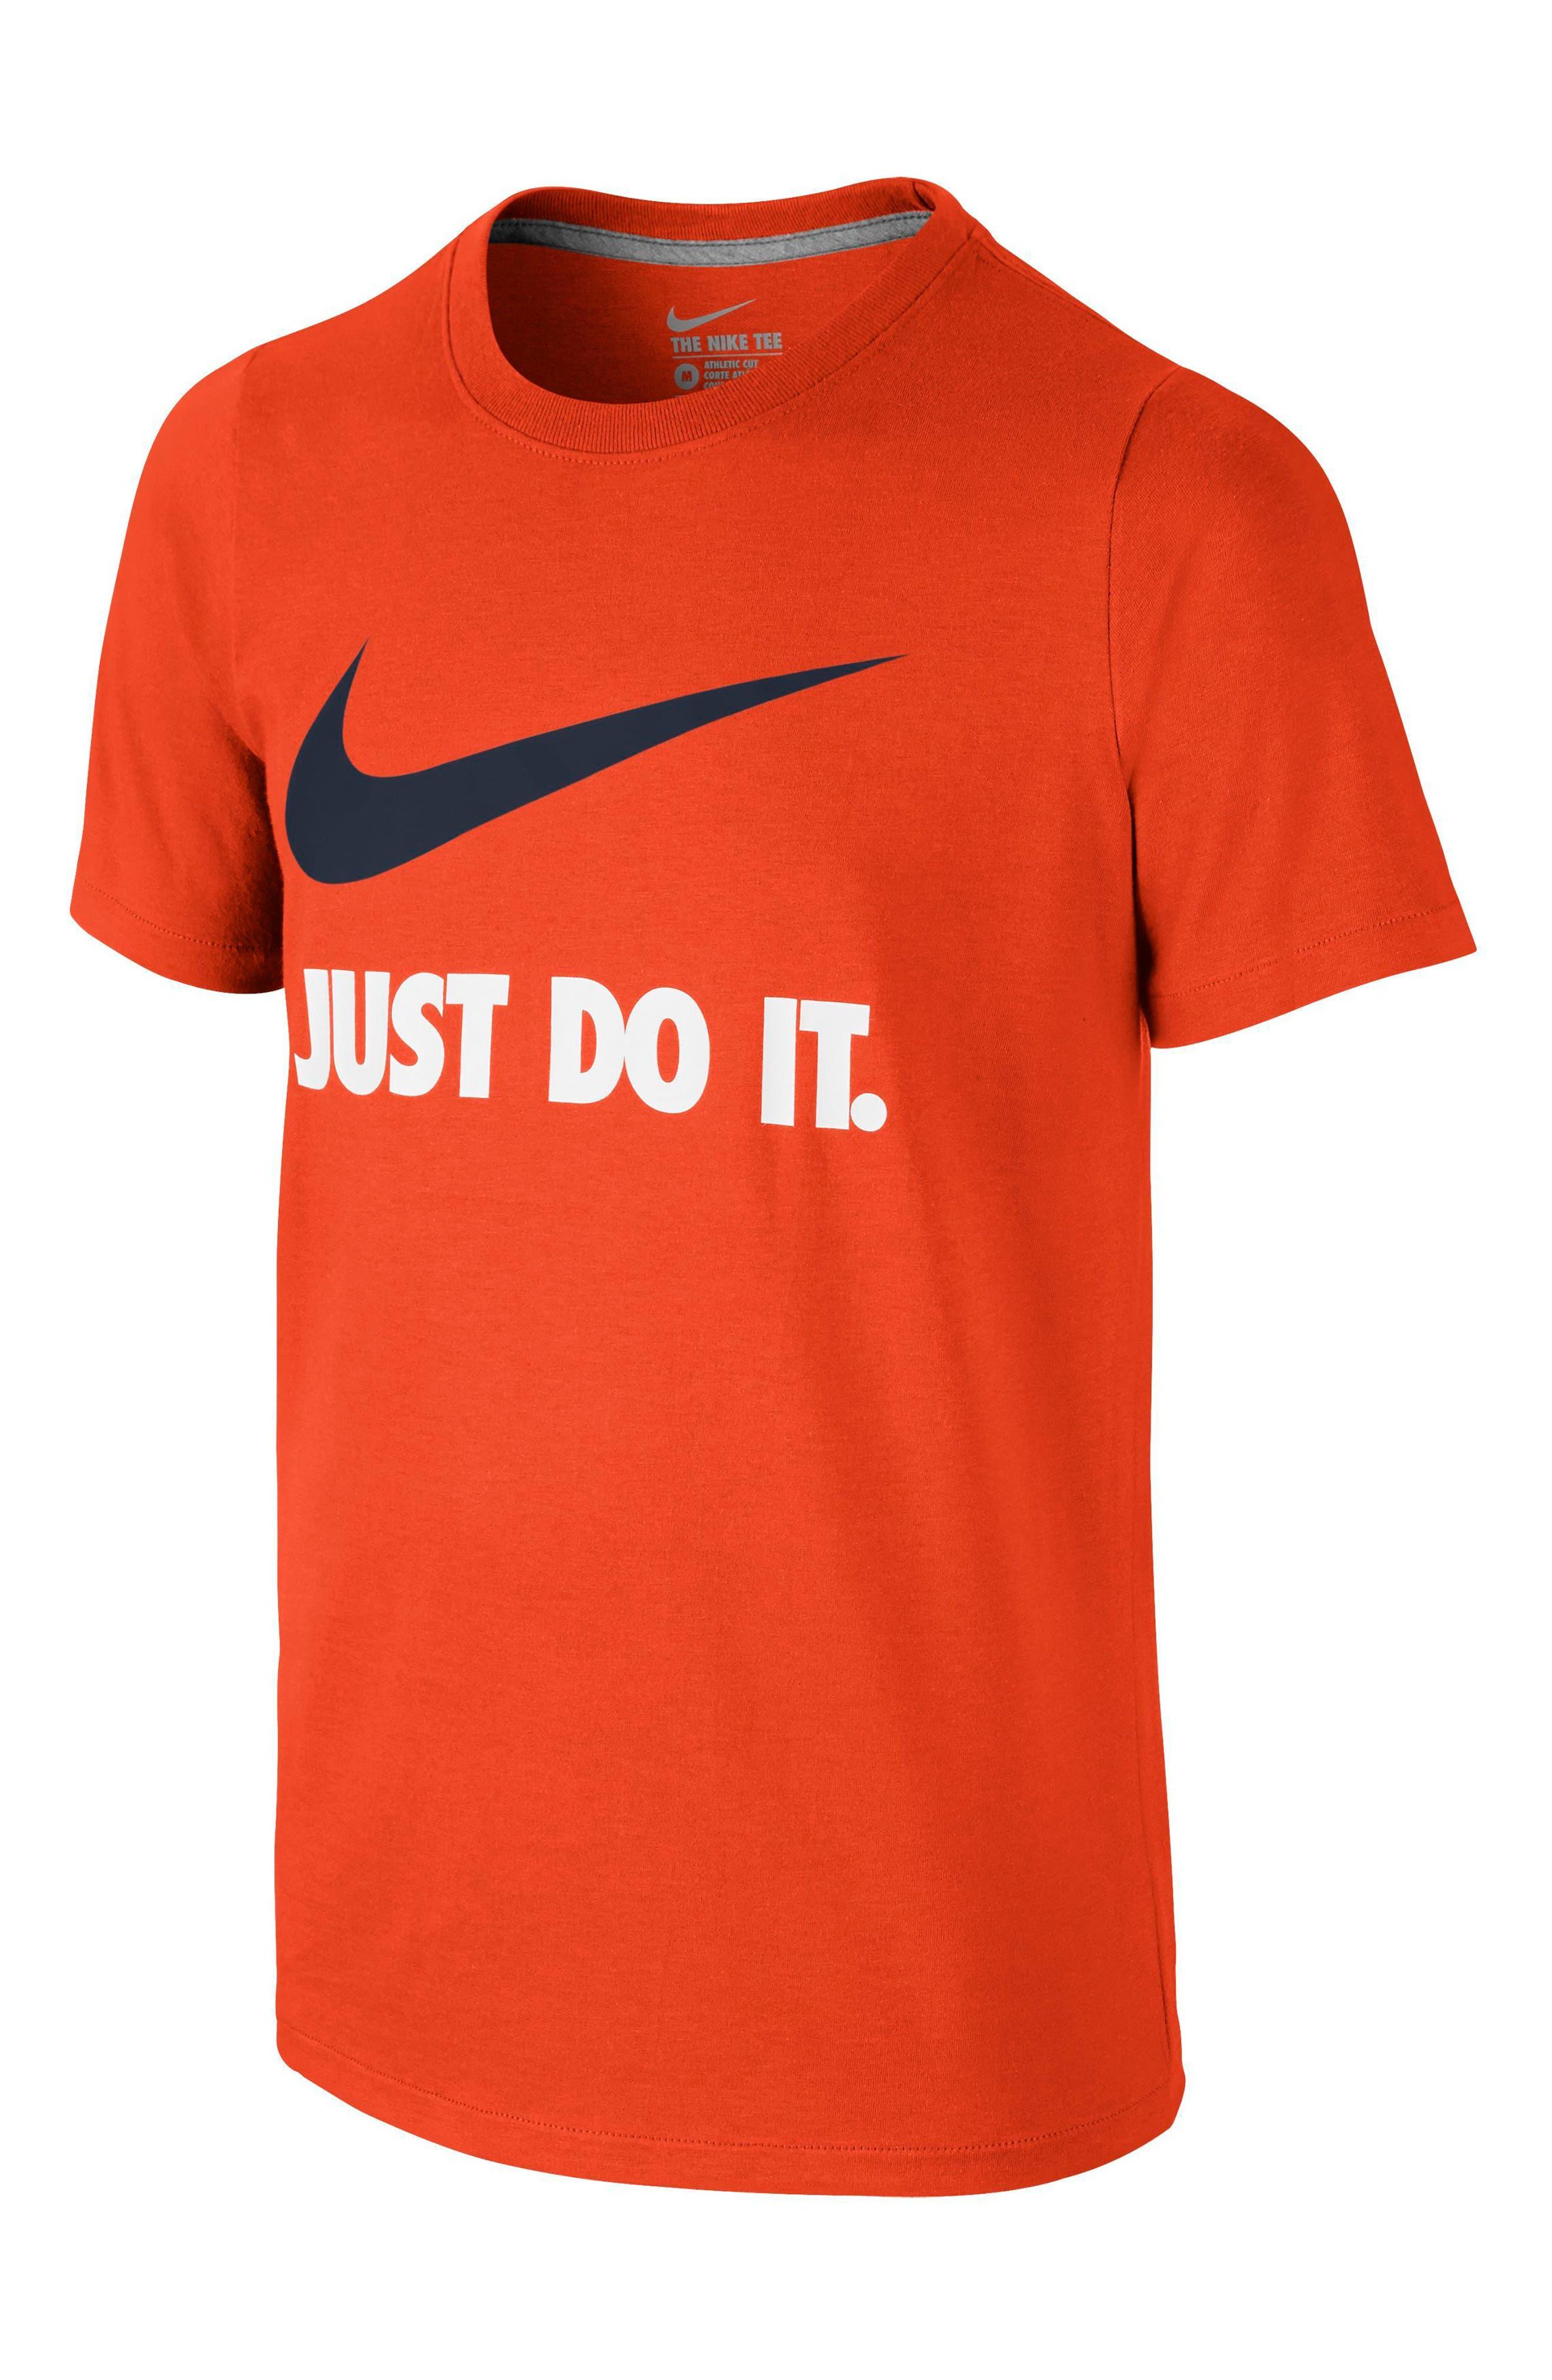 Main Image - Nike Just Do It Cotton T-Shirt (Little Boys & Big Boys)